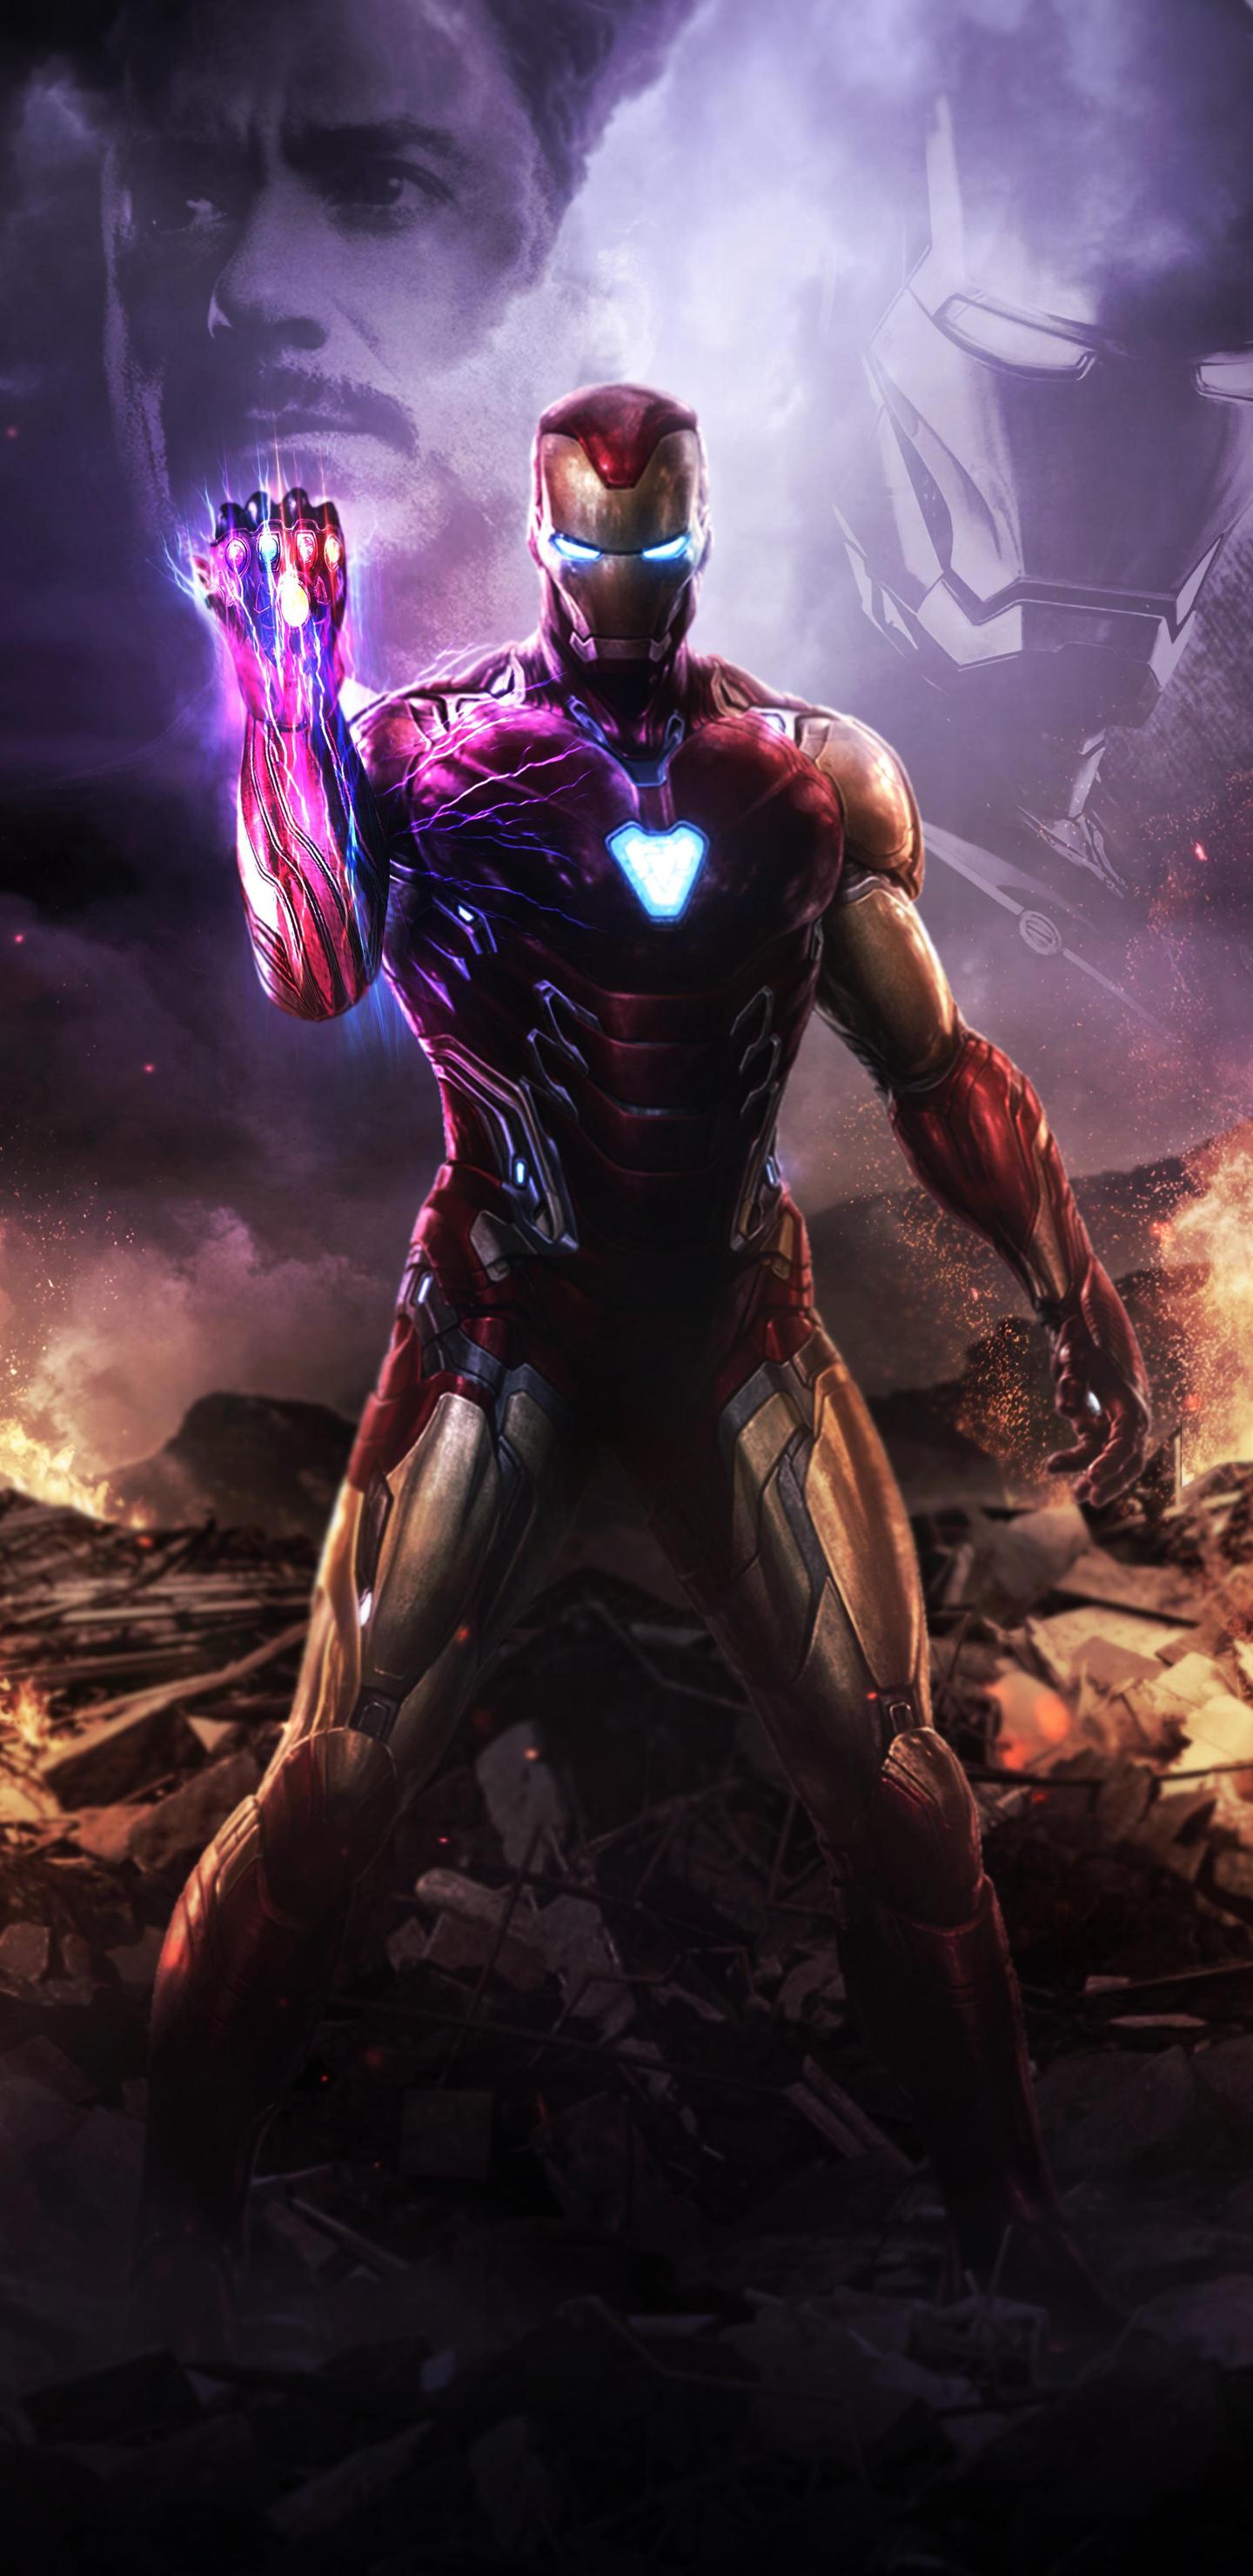 1440x2960 Iron Man Infinity Gauntlet 4k Samsung Galaxy Note